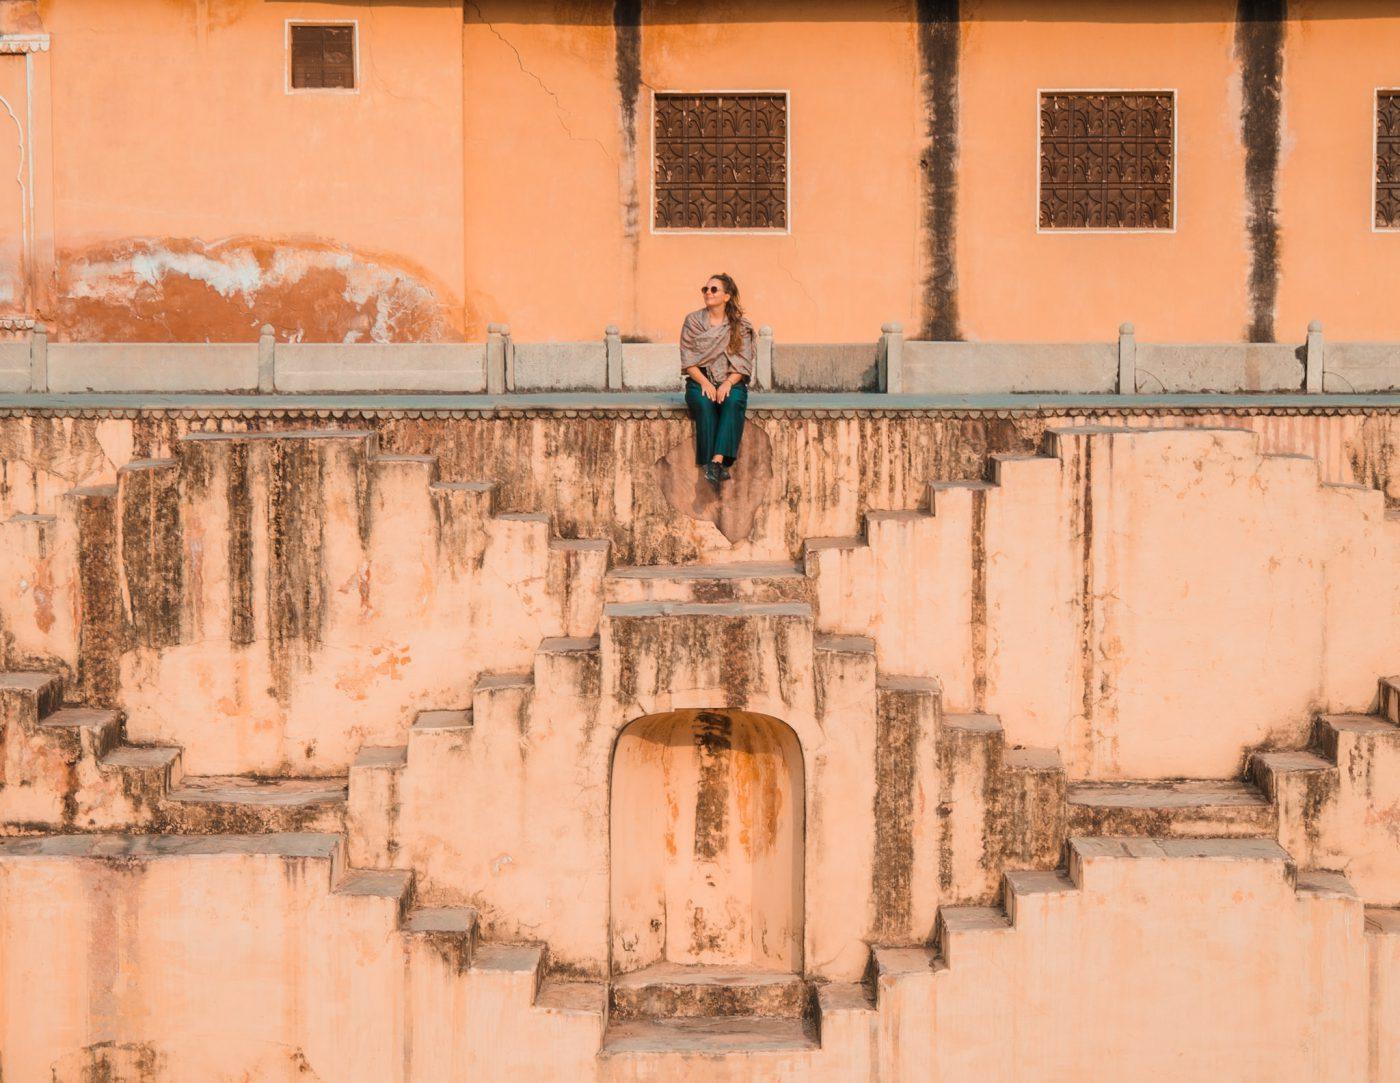 Stepwell in Jaipur, Indien